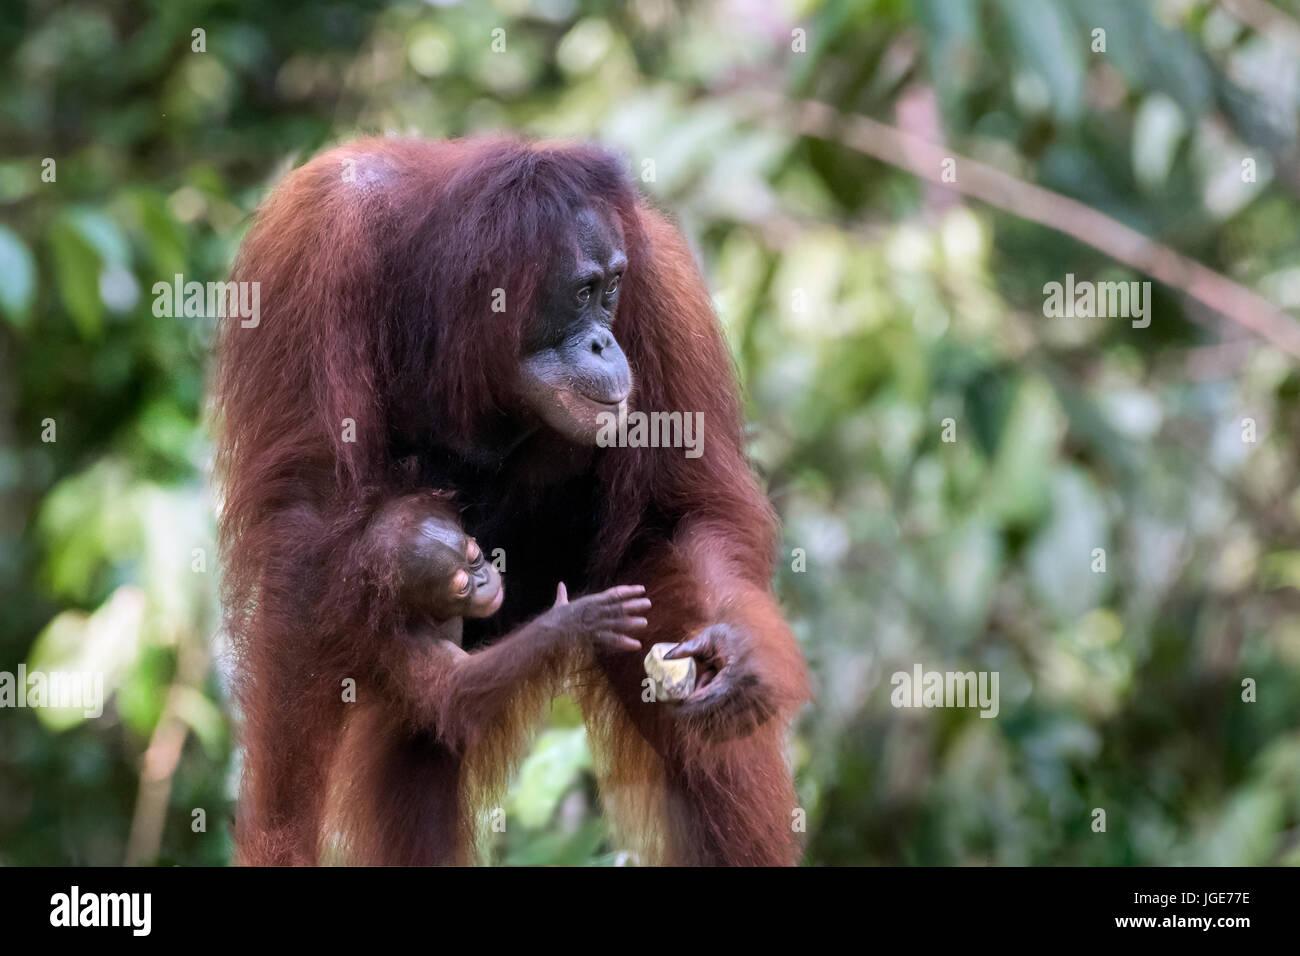 Baby orangutan trying to grab mother's banana at a feeding station, Tanjung Puting NP, Indonesia - Stock Image